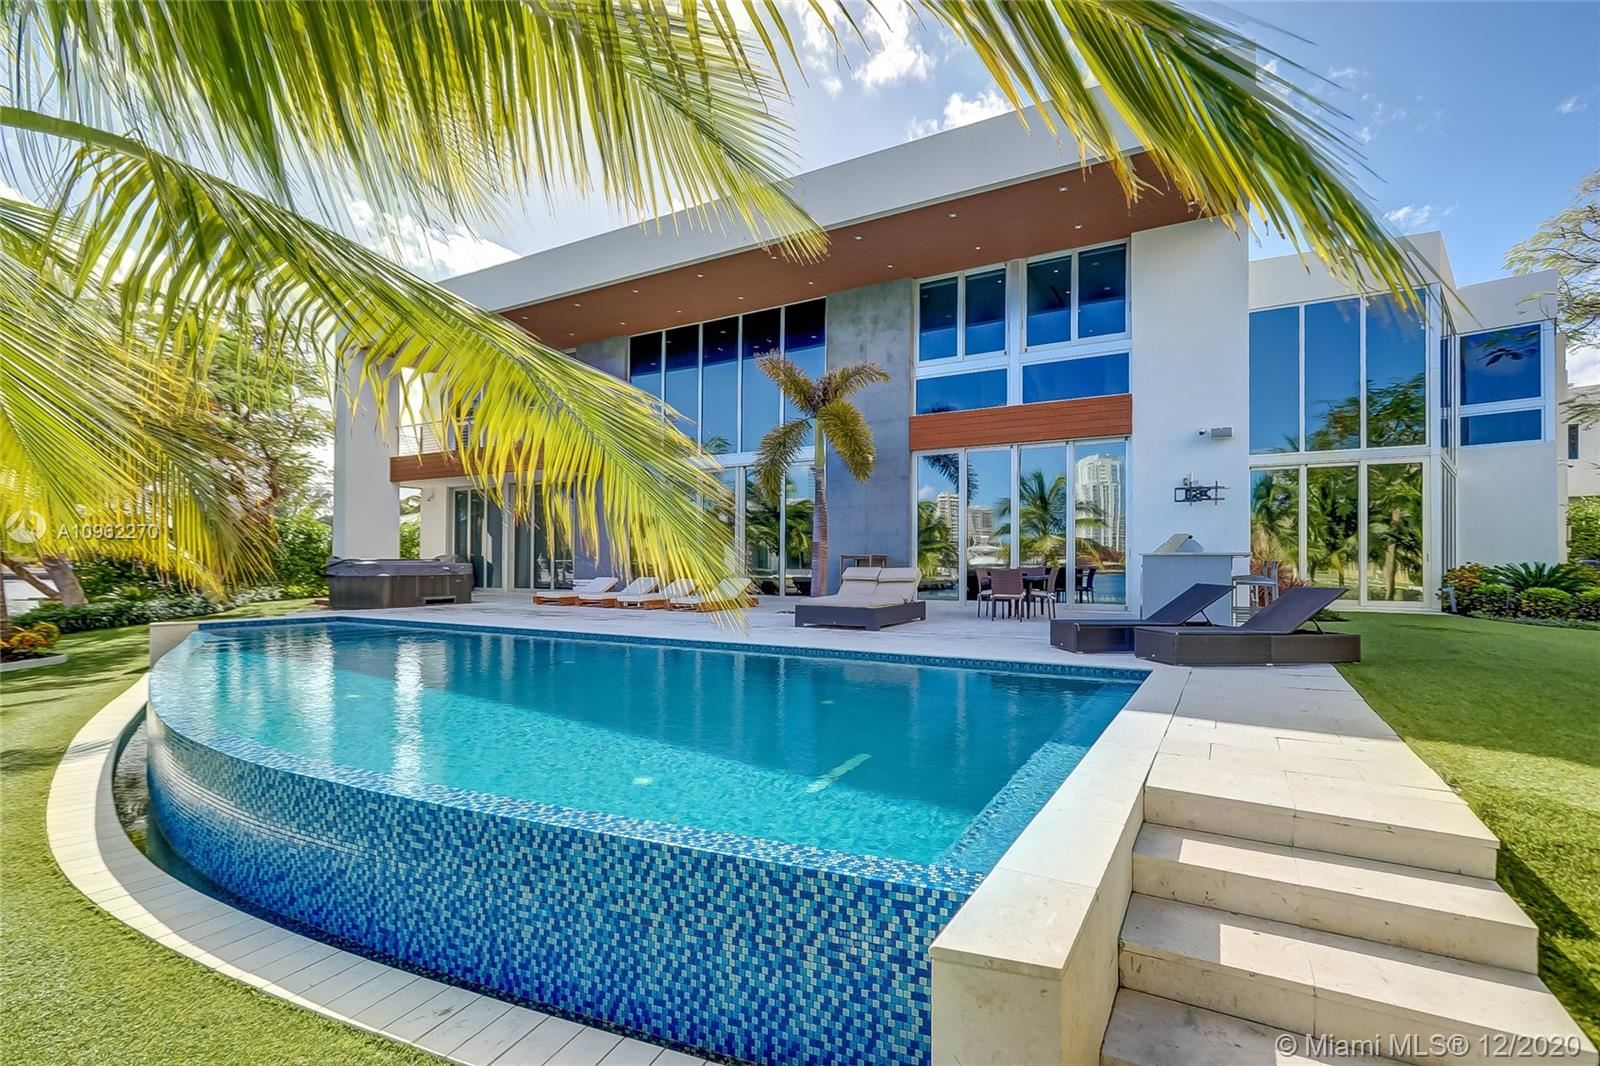 Photo of 400 Tamarind Dr, Hallandale Beach, FL 33009 (MLS # A10962270)